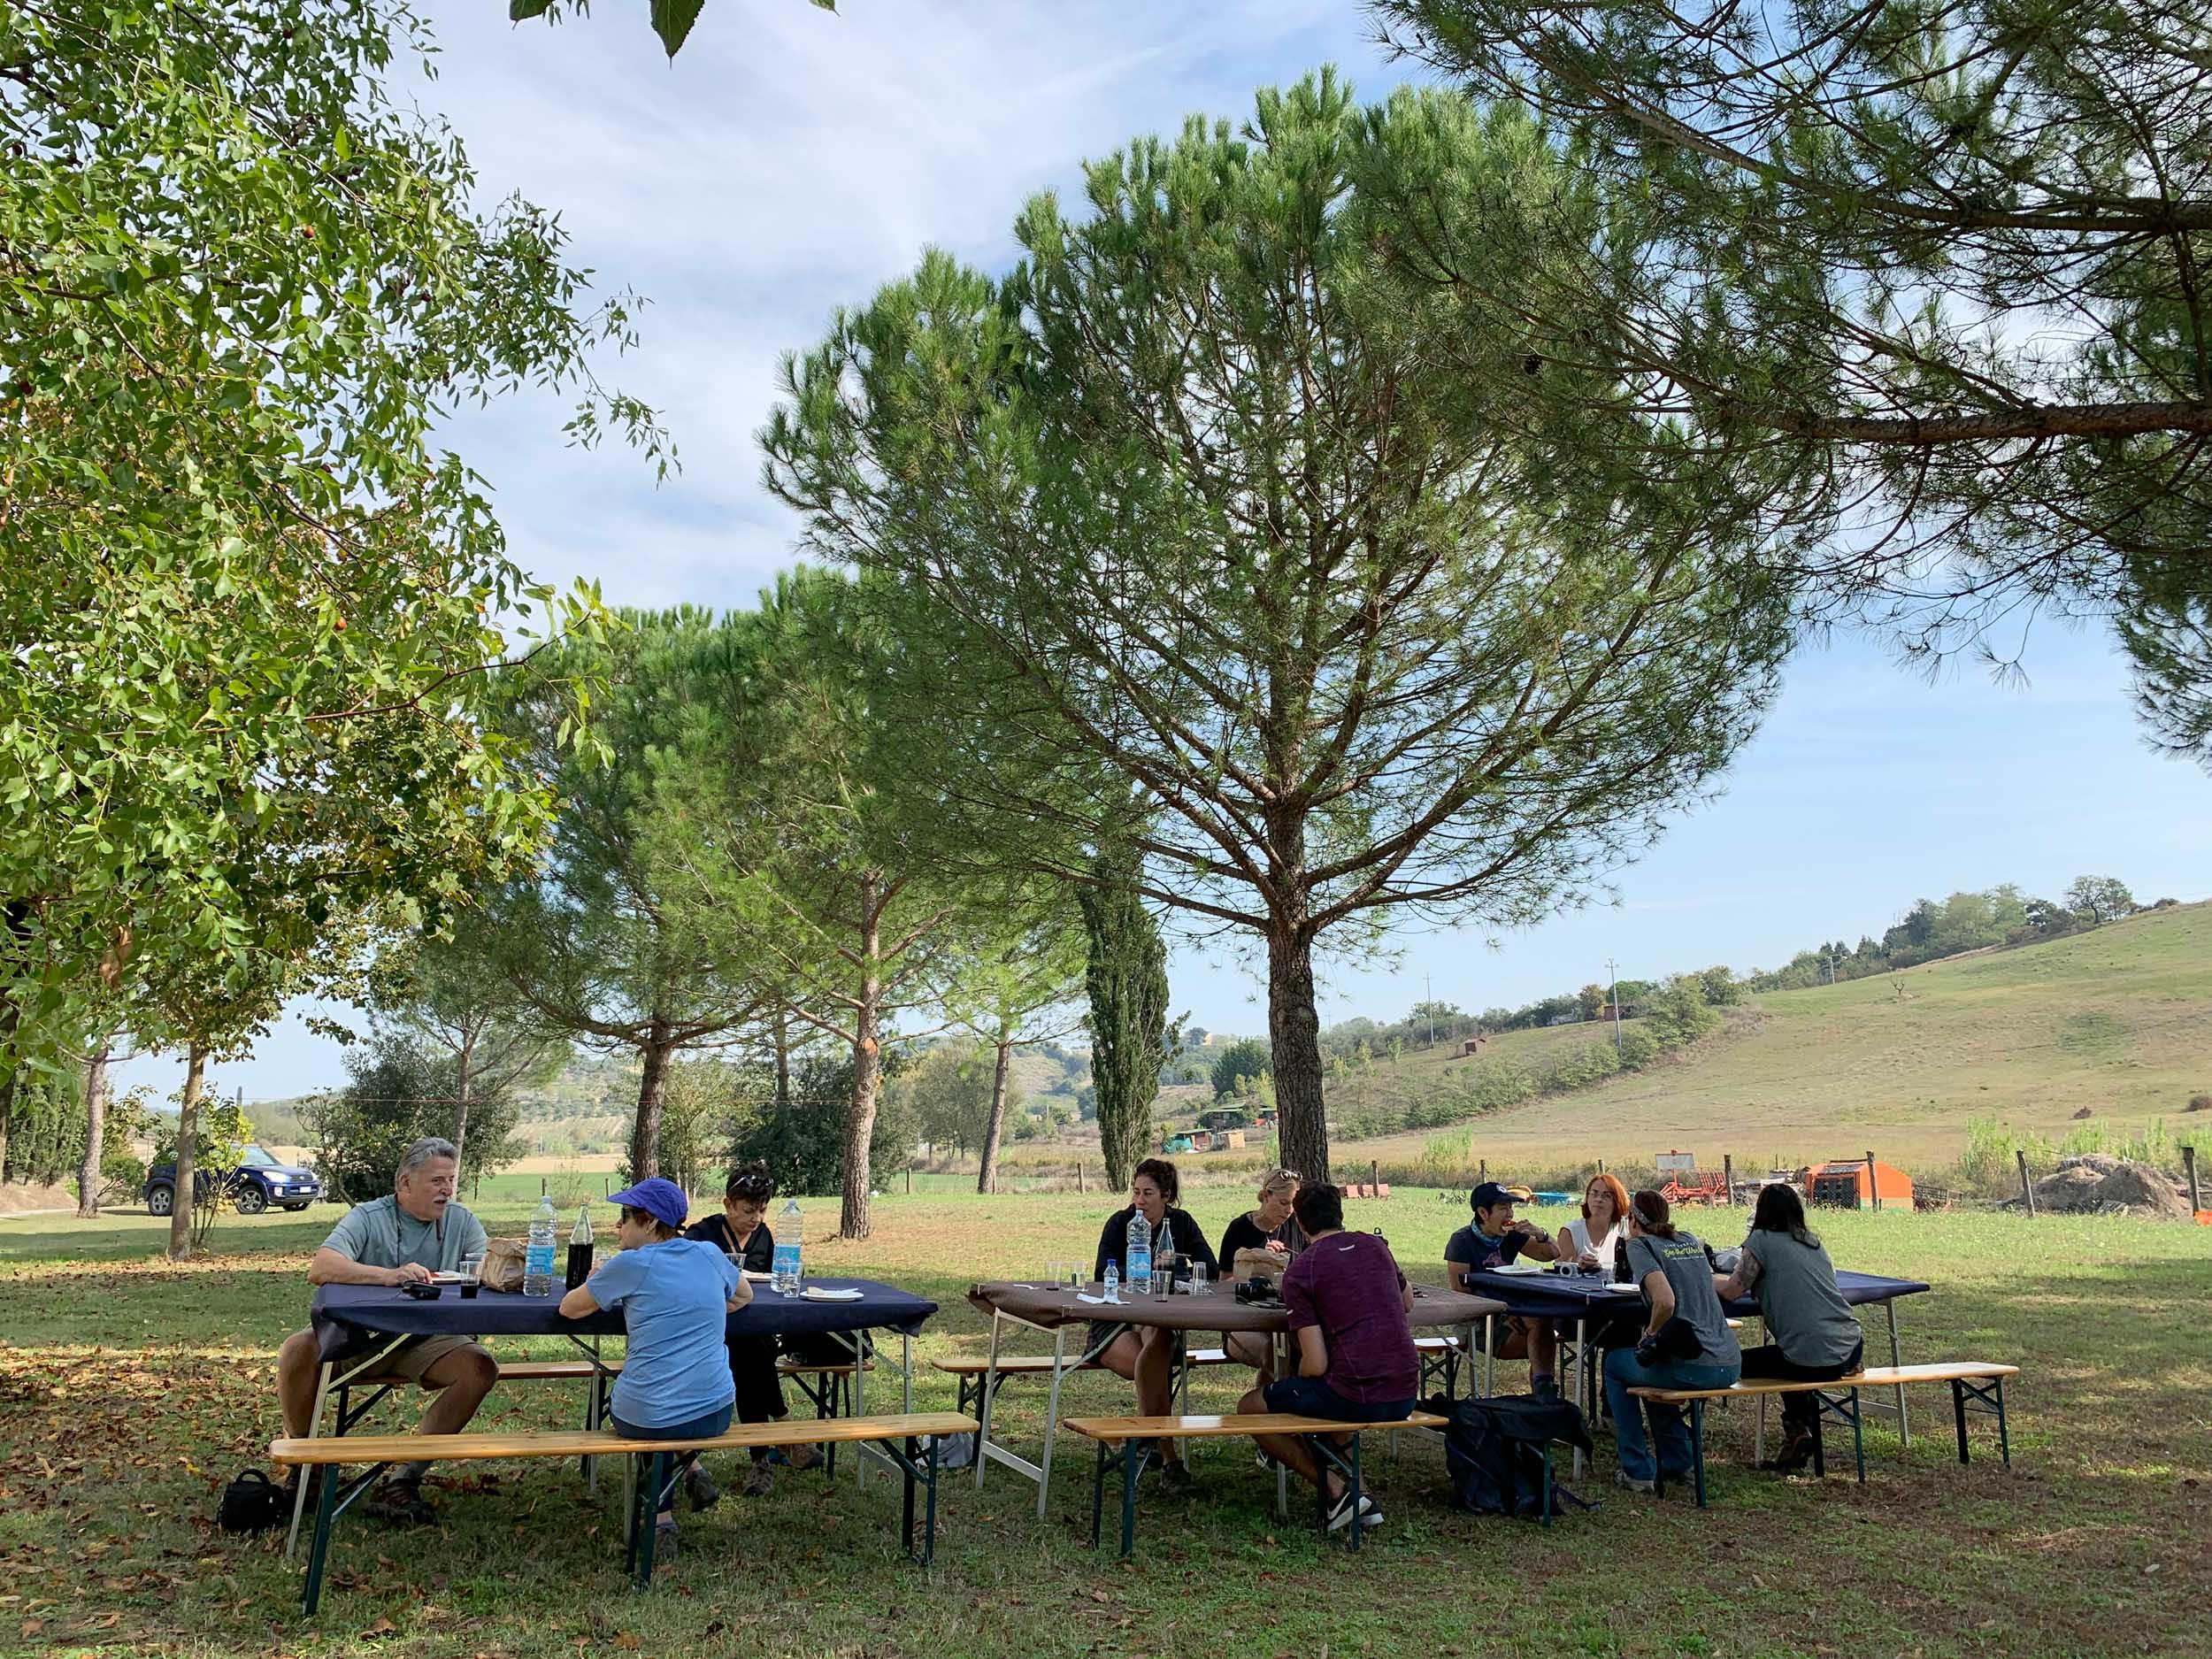 Lunch on an organic farm